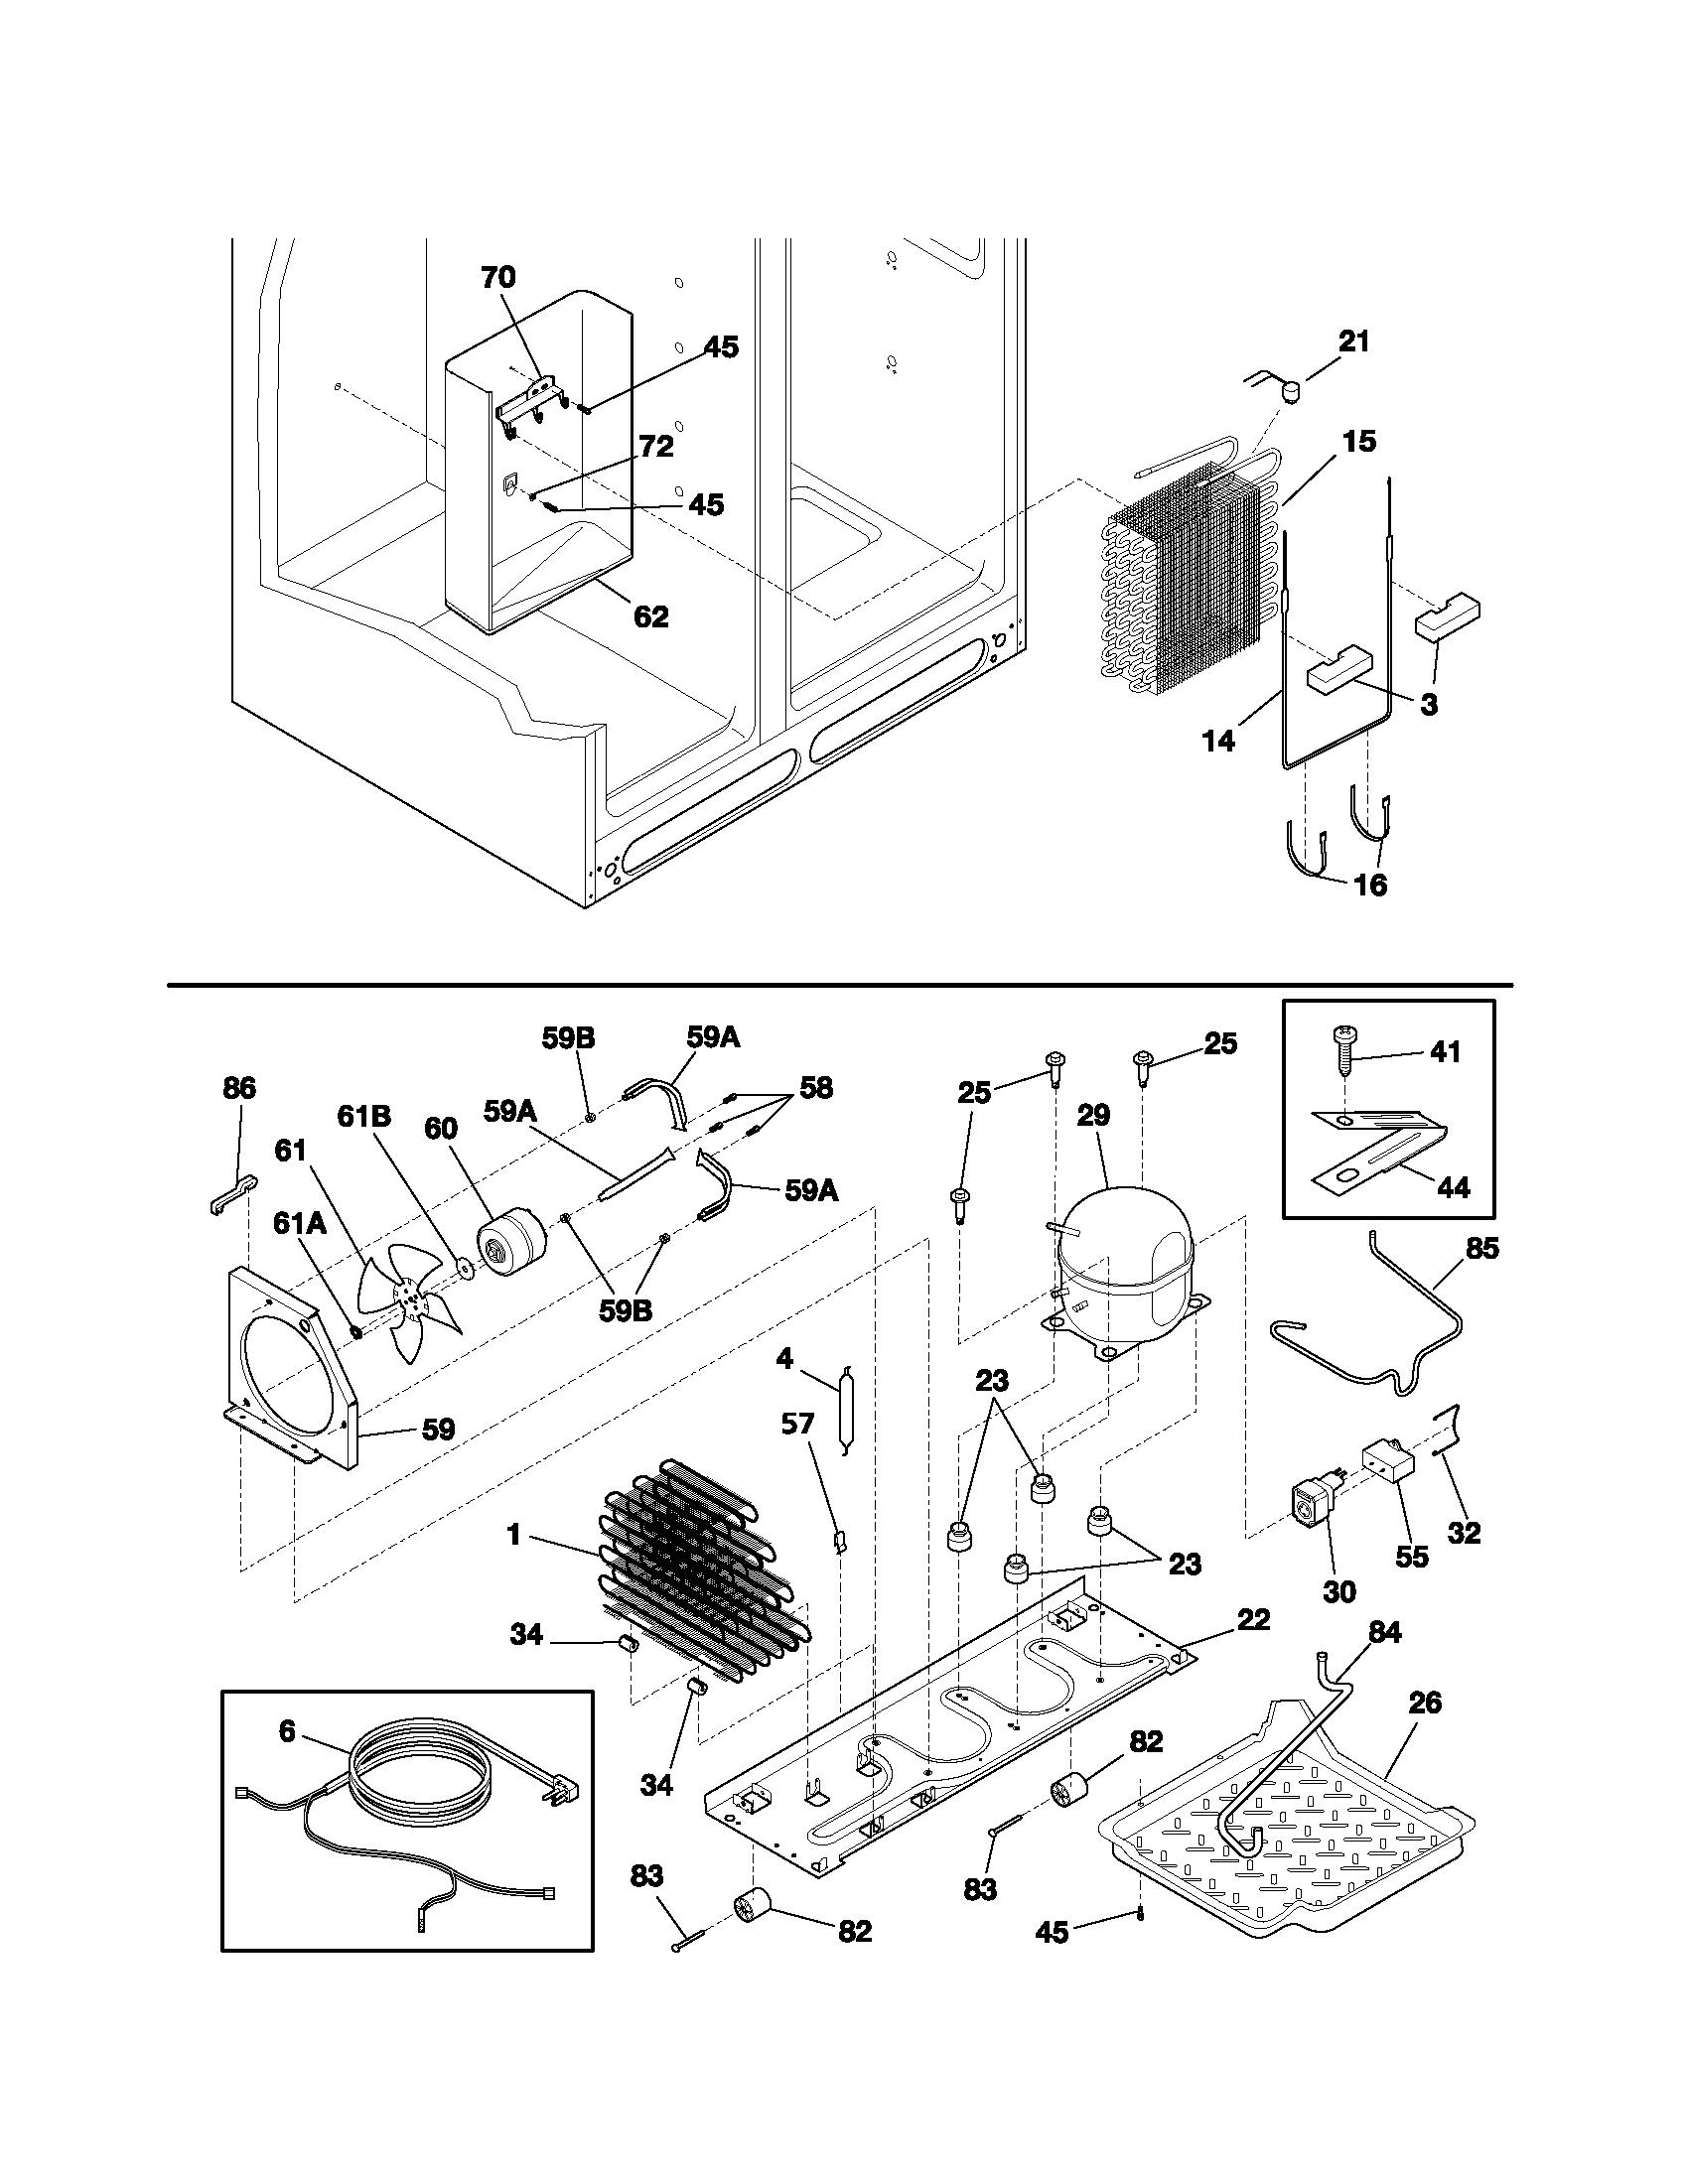 Air conditioner vs evaporative cooling grihon ac coolers wiring diagram